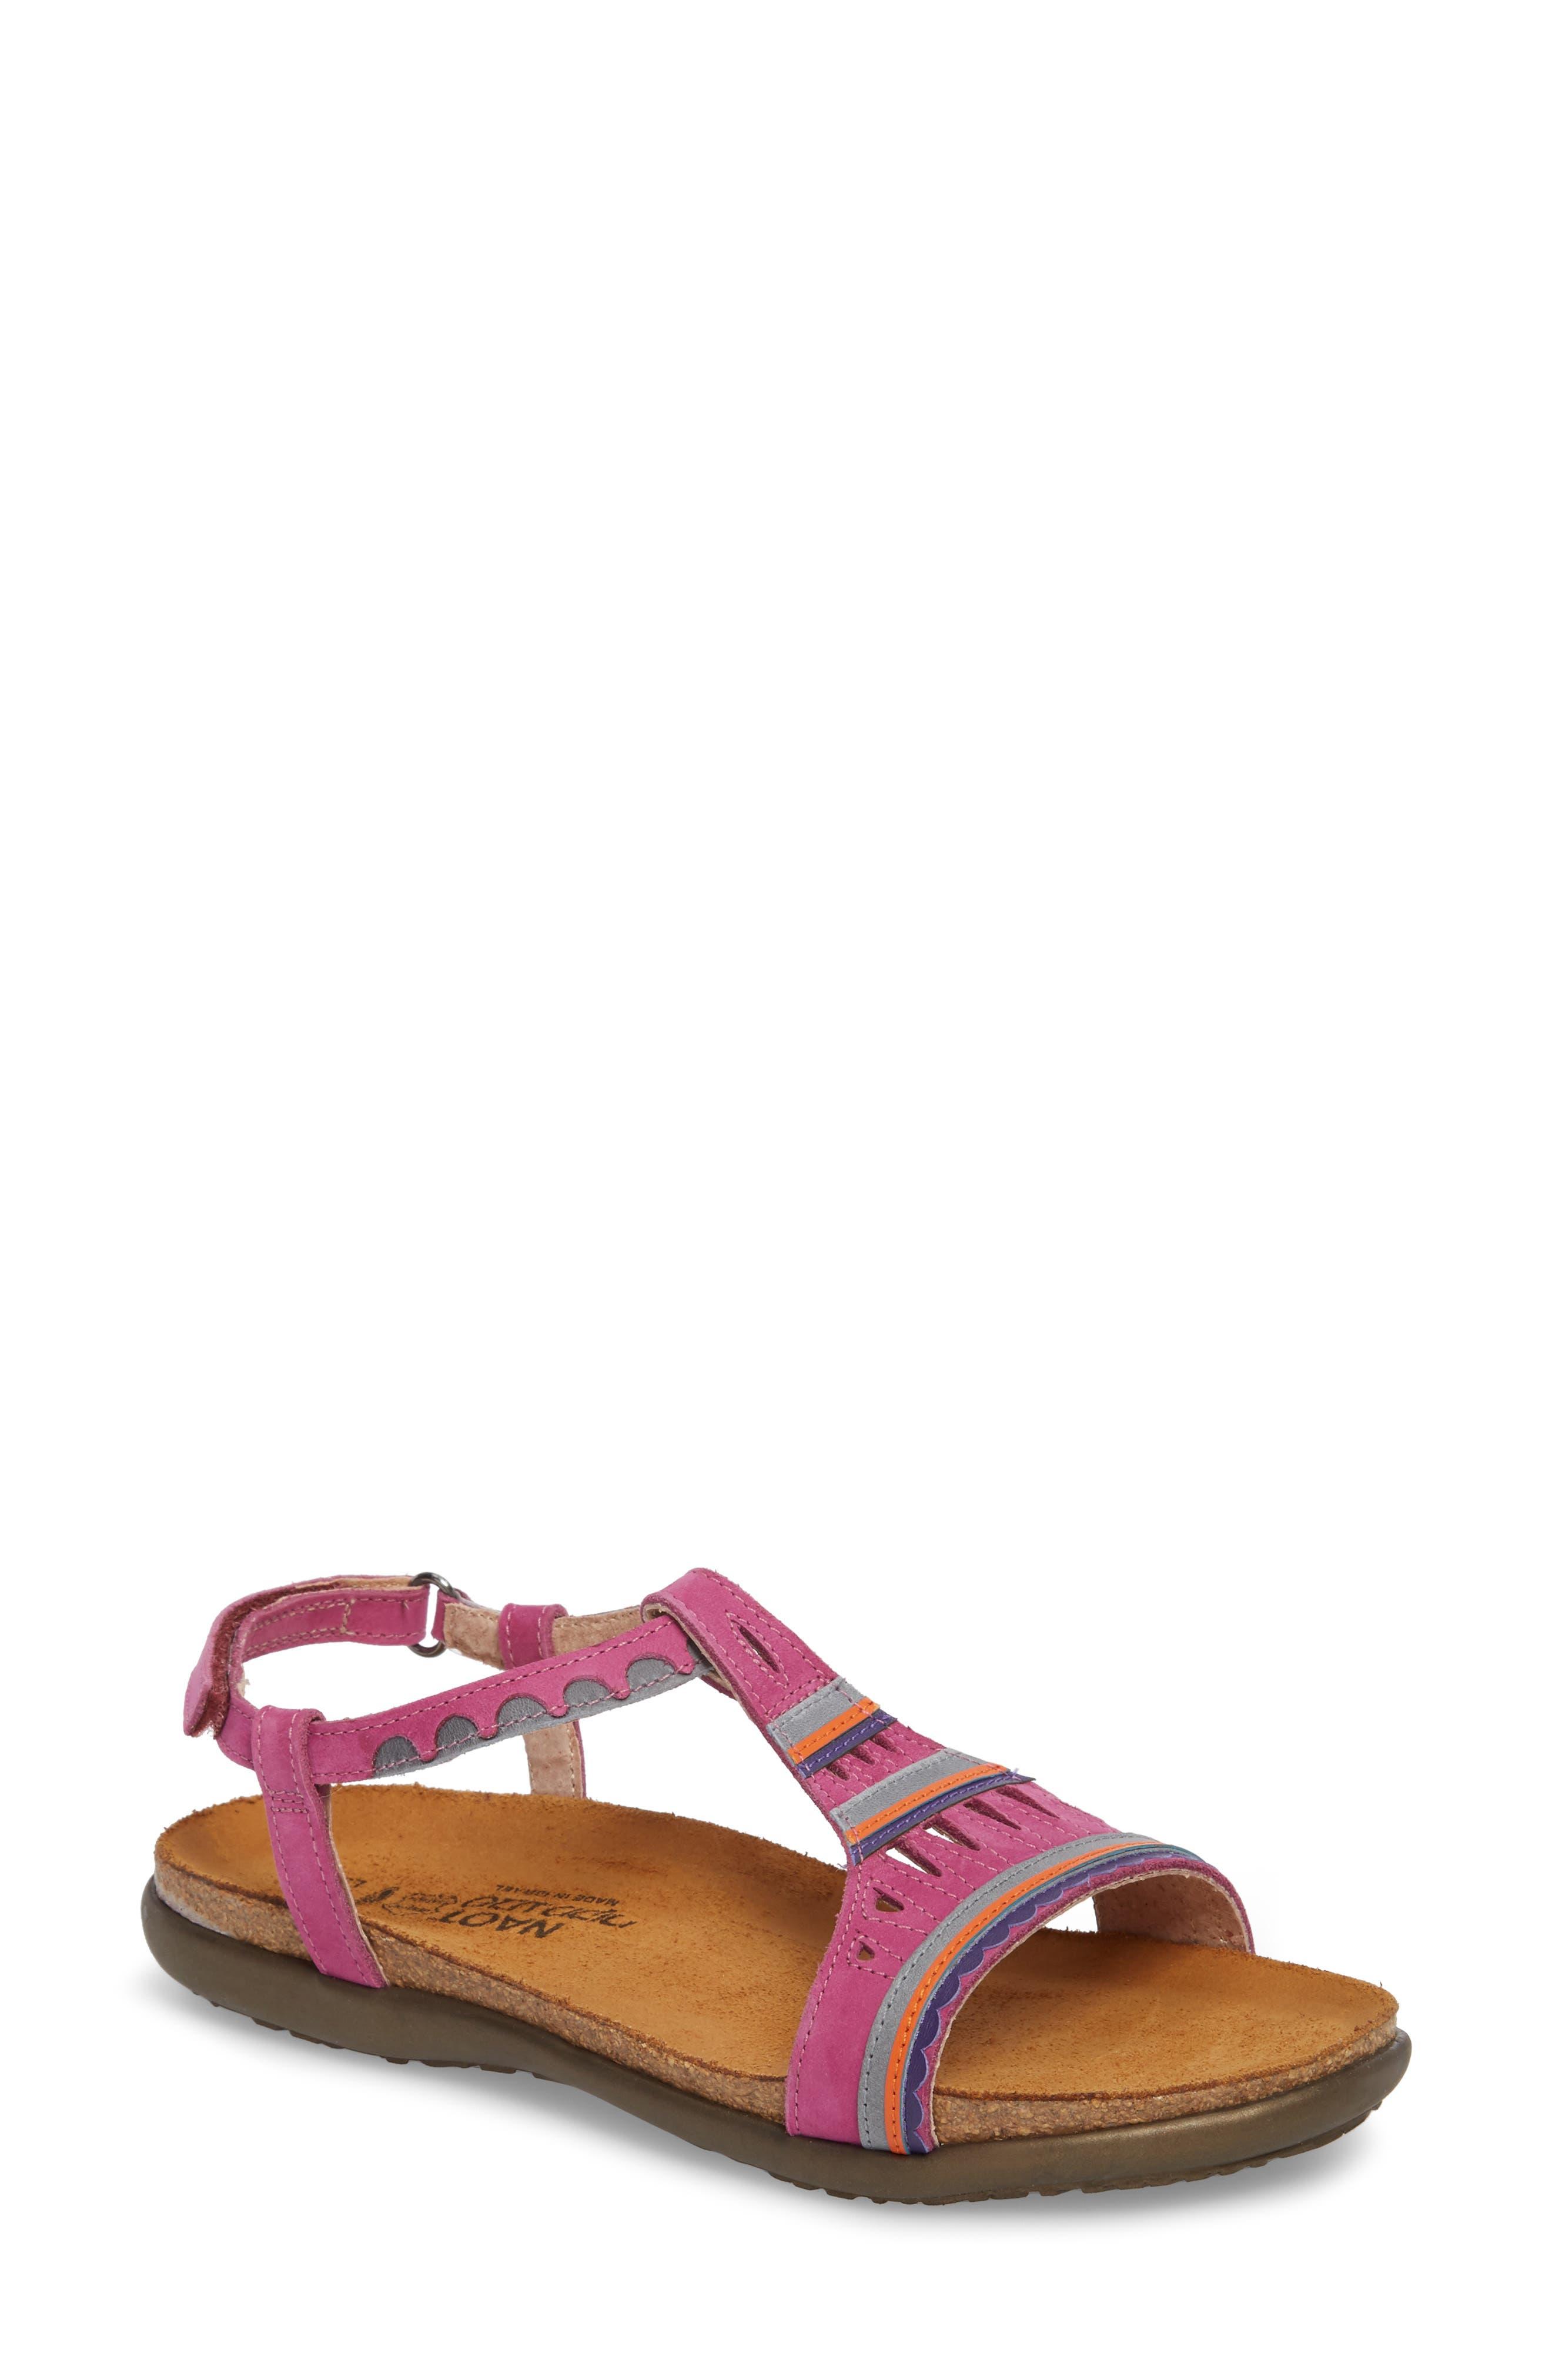 NAOT, Odelia Perforated T-Strap Sandal, Main thumbnail 1, color, PINK PLUM NUBUCK